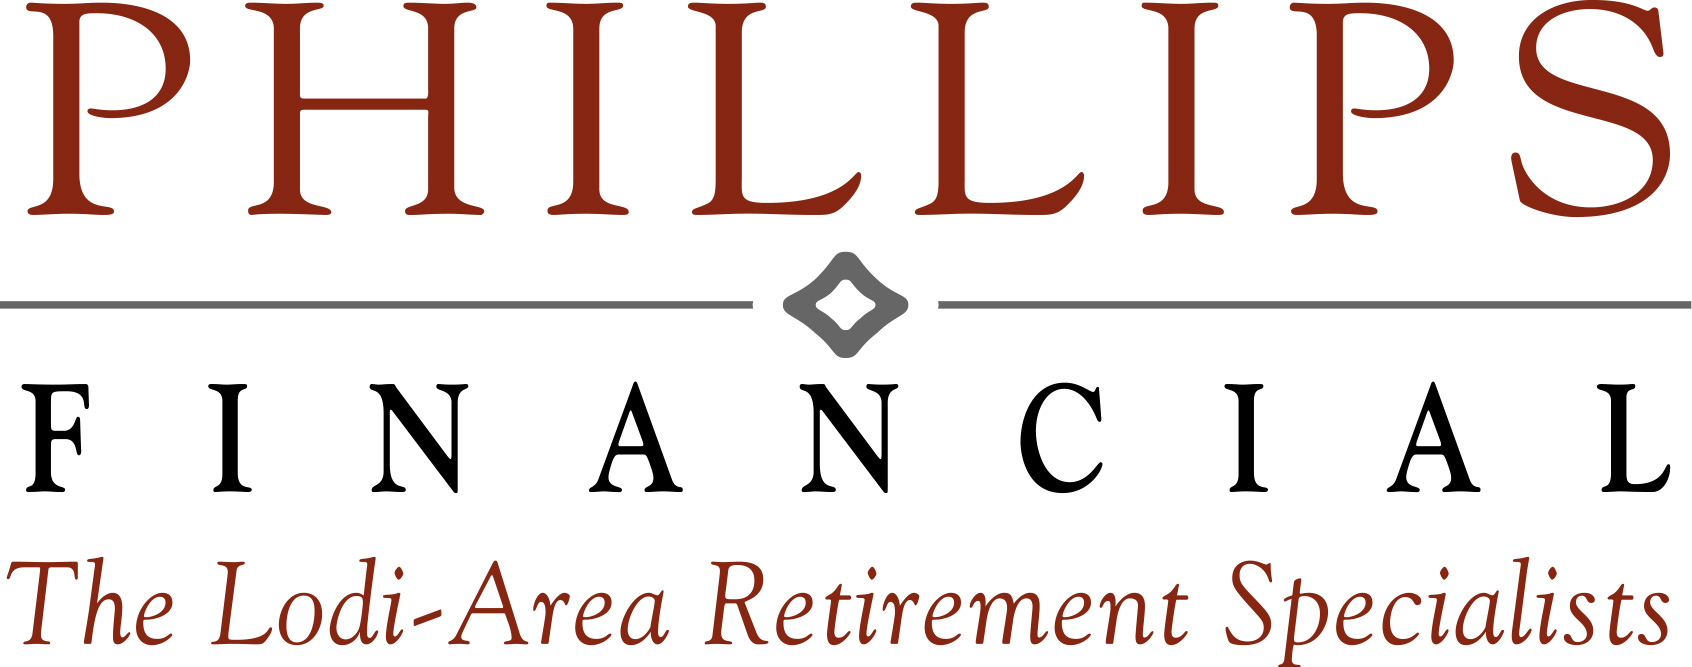 PHILLIPS FINANCIAL - The Lodi Area Retirement Specialist